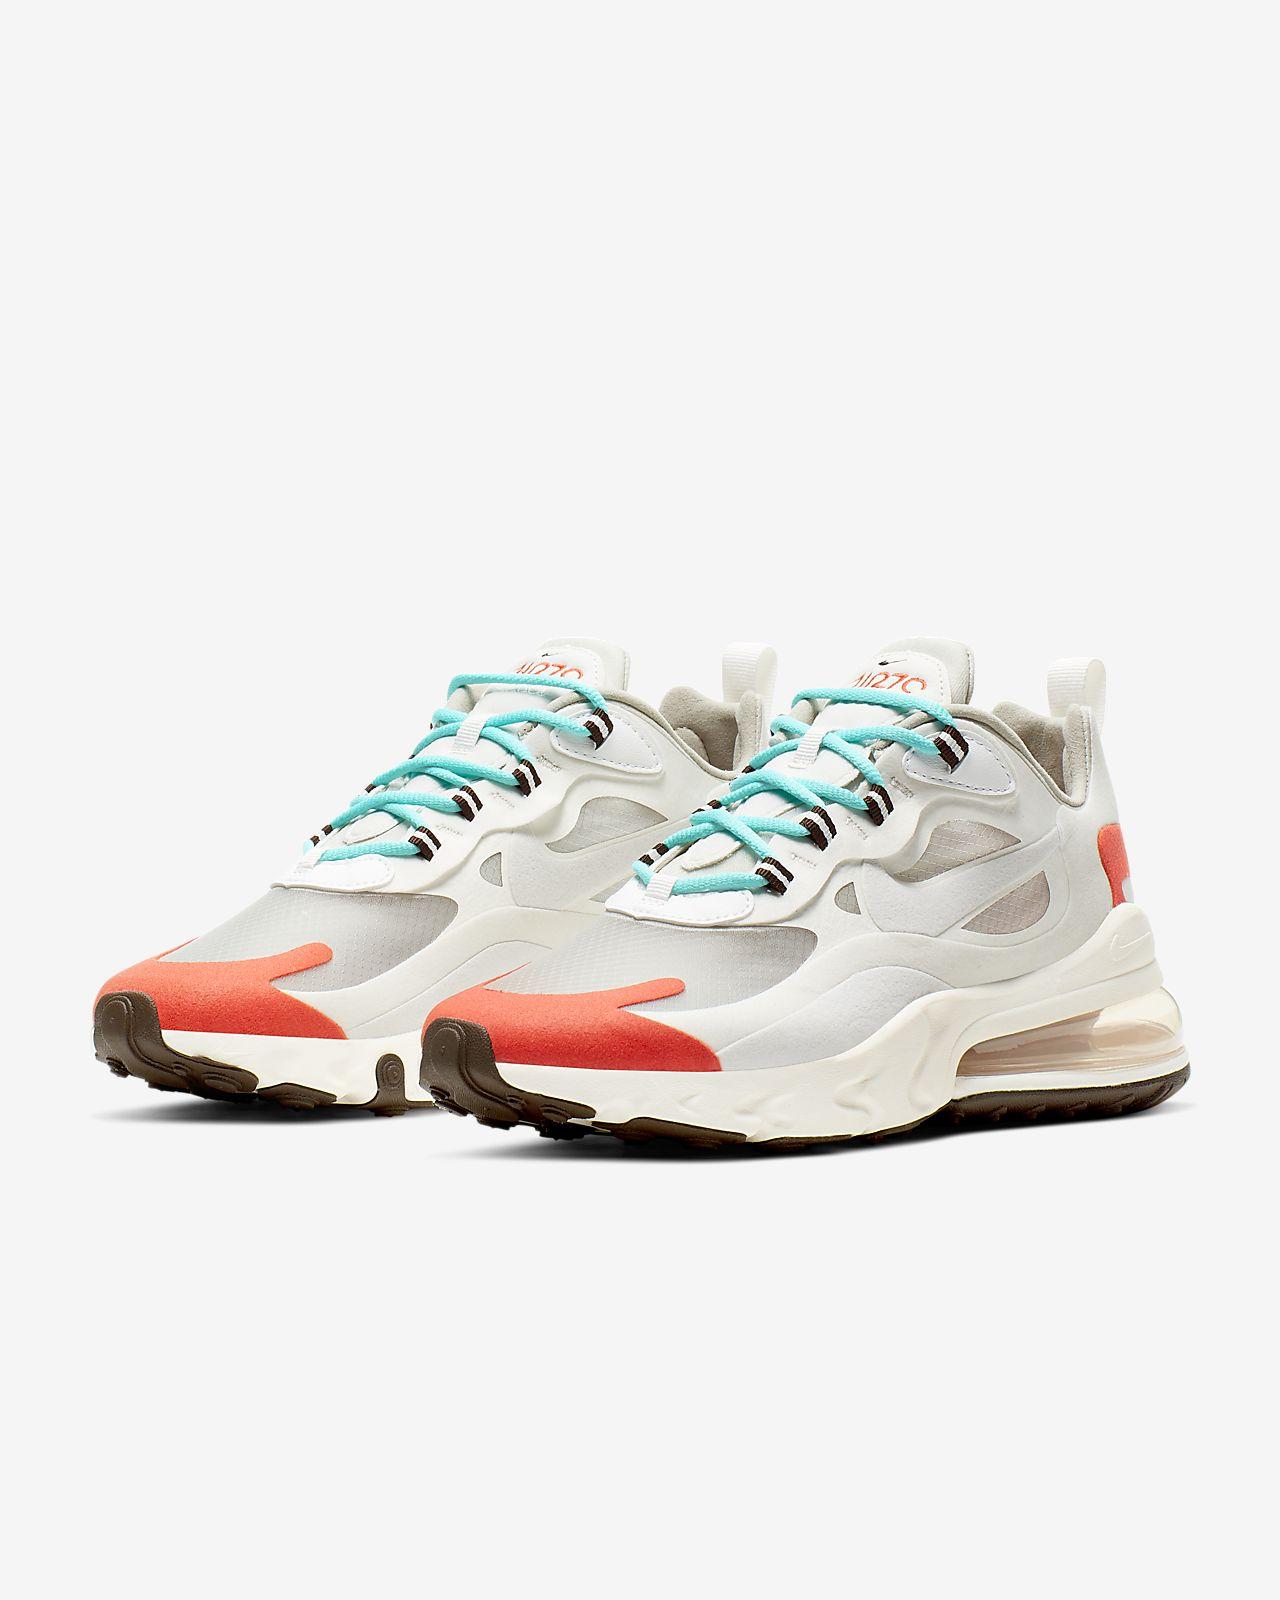 Nike Air Max 270 React (Mid Century) Women's Shoe